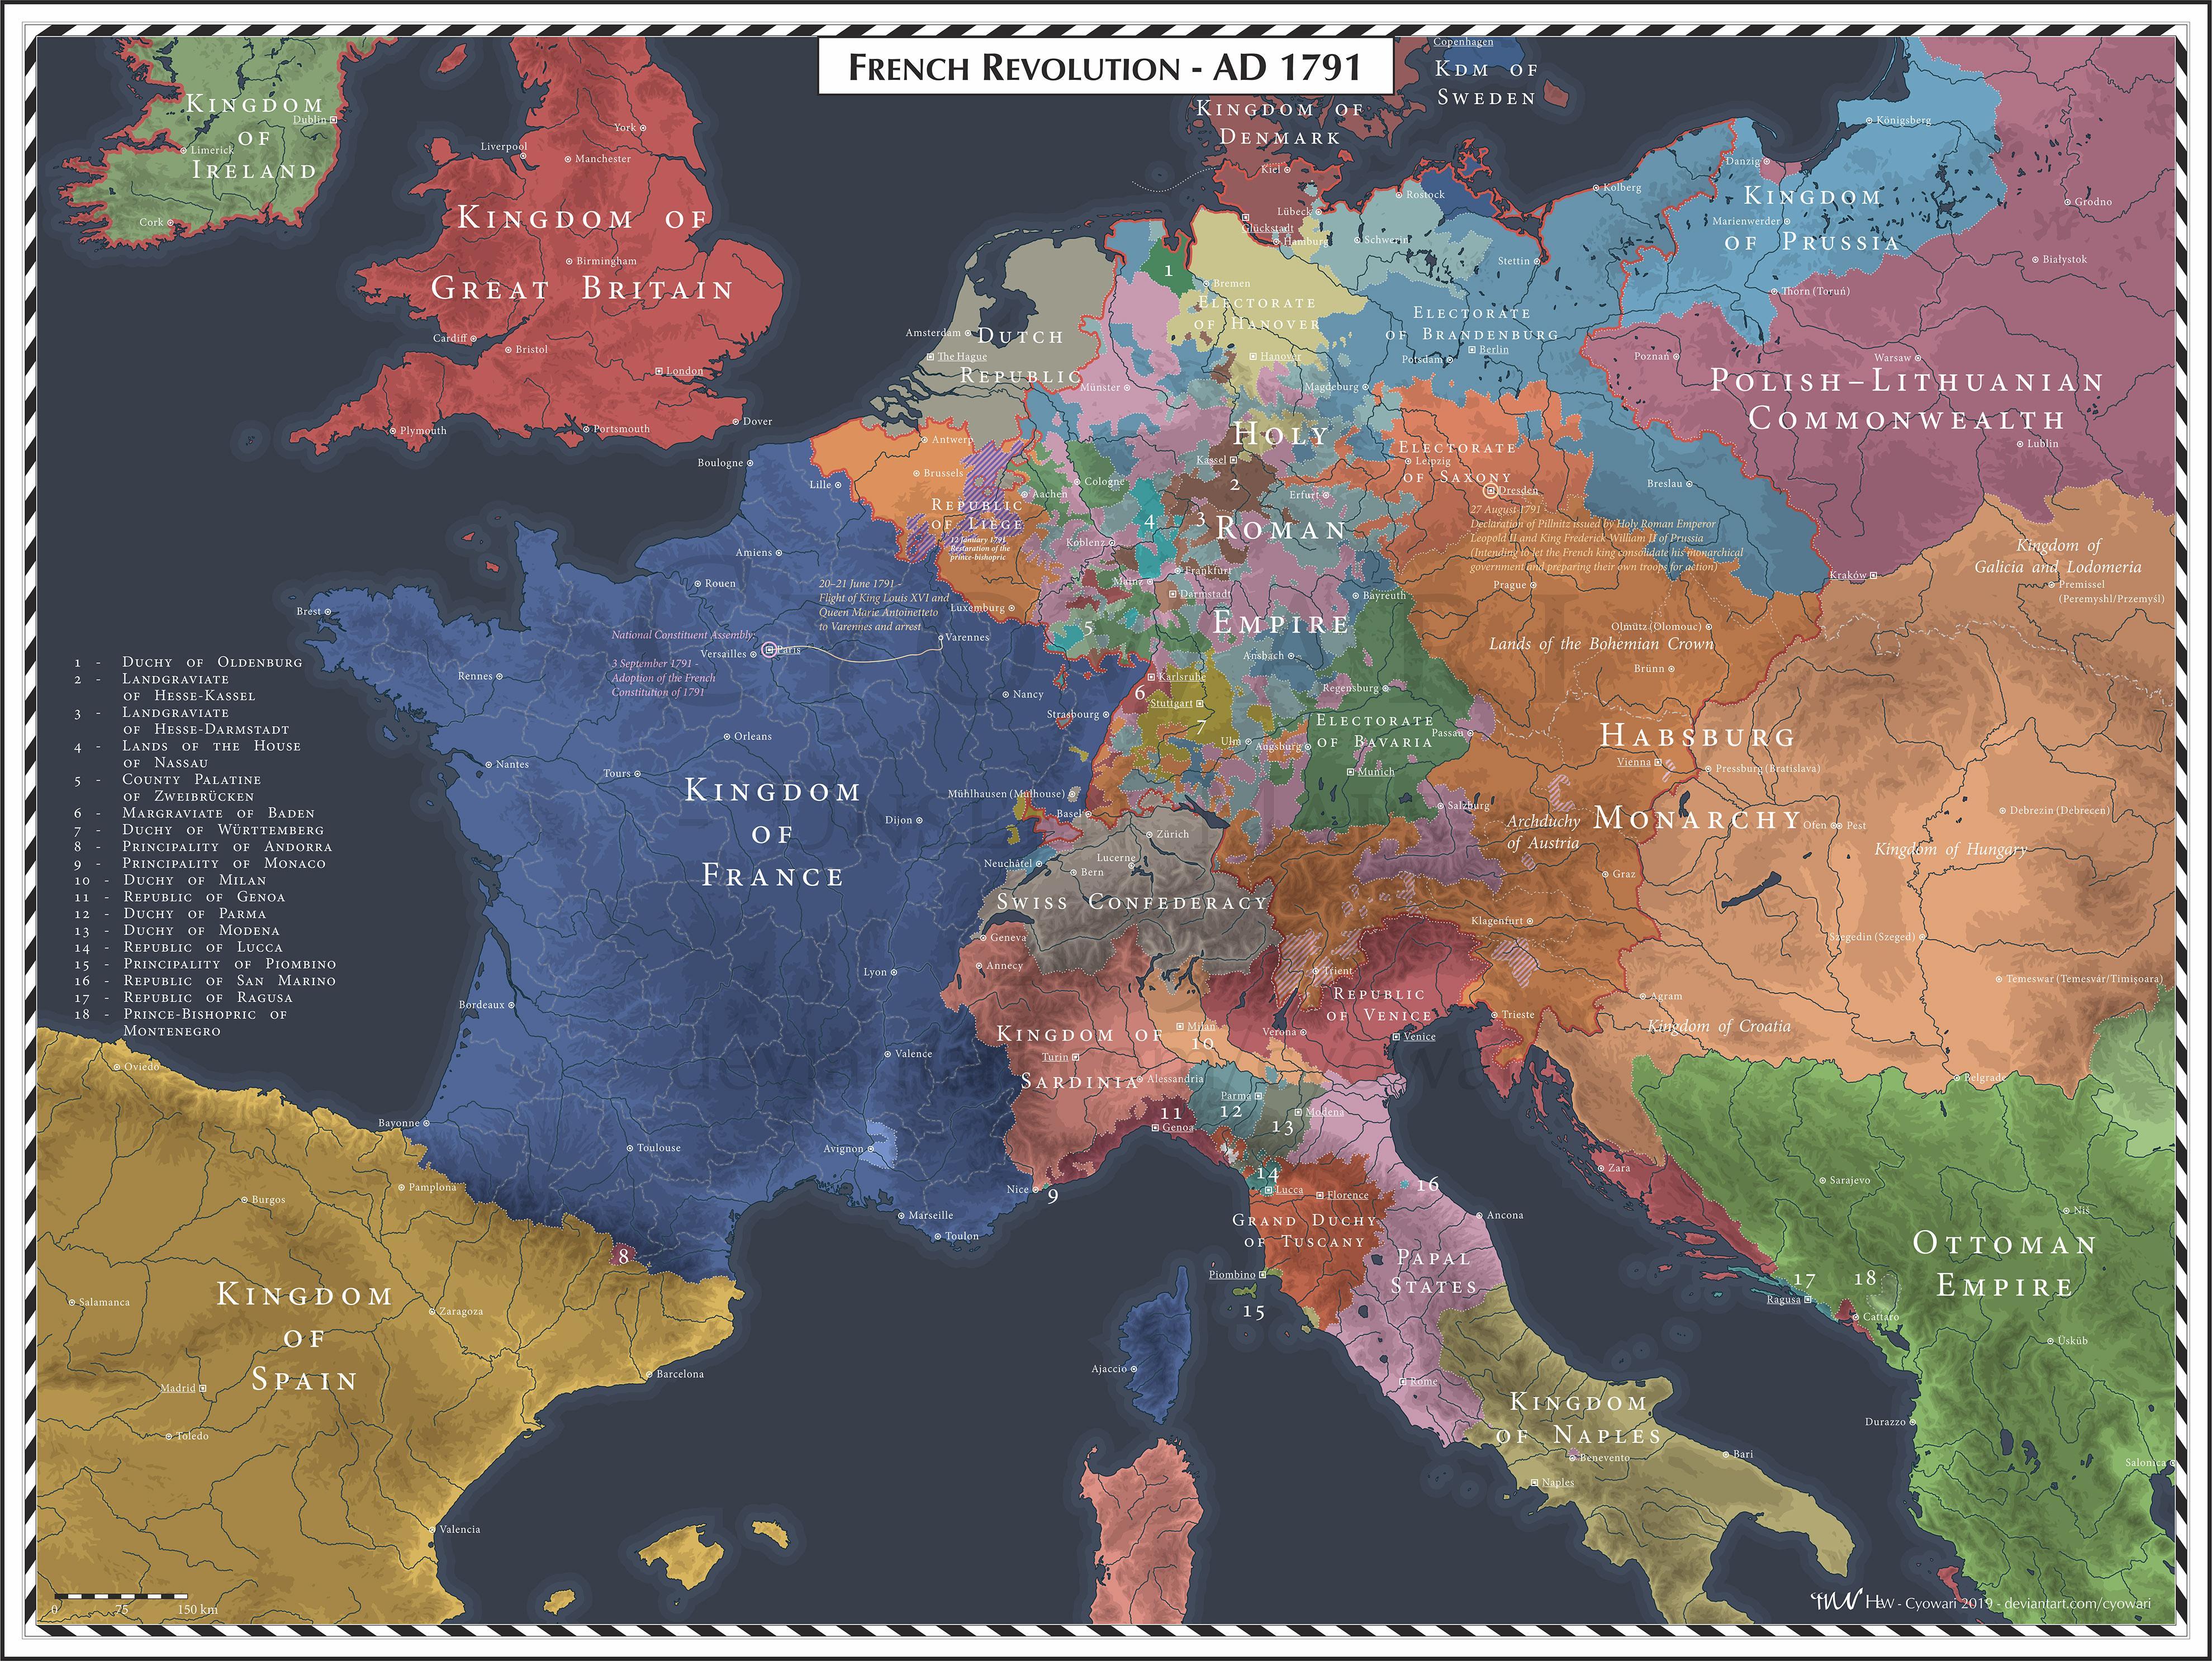 French Revolution - 1791